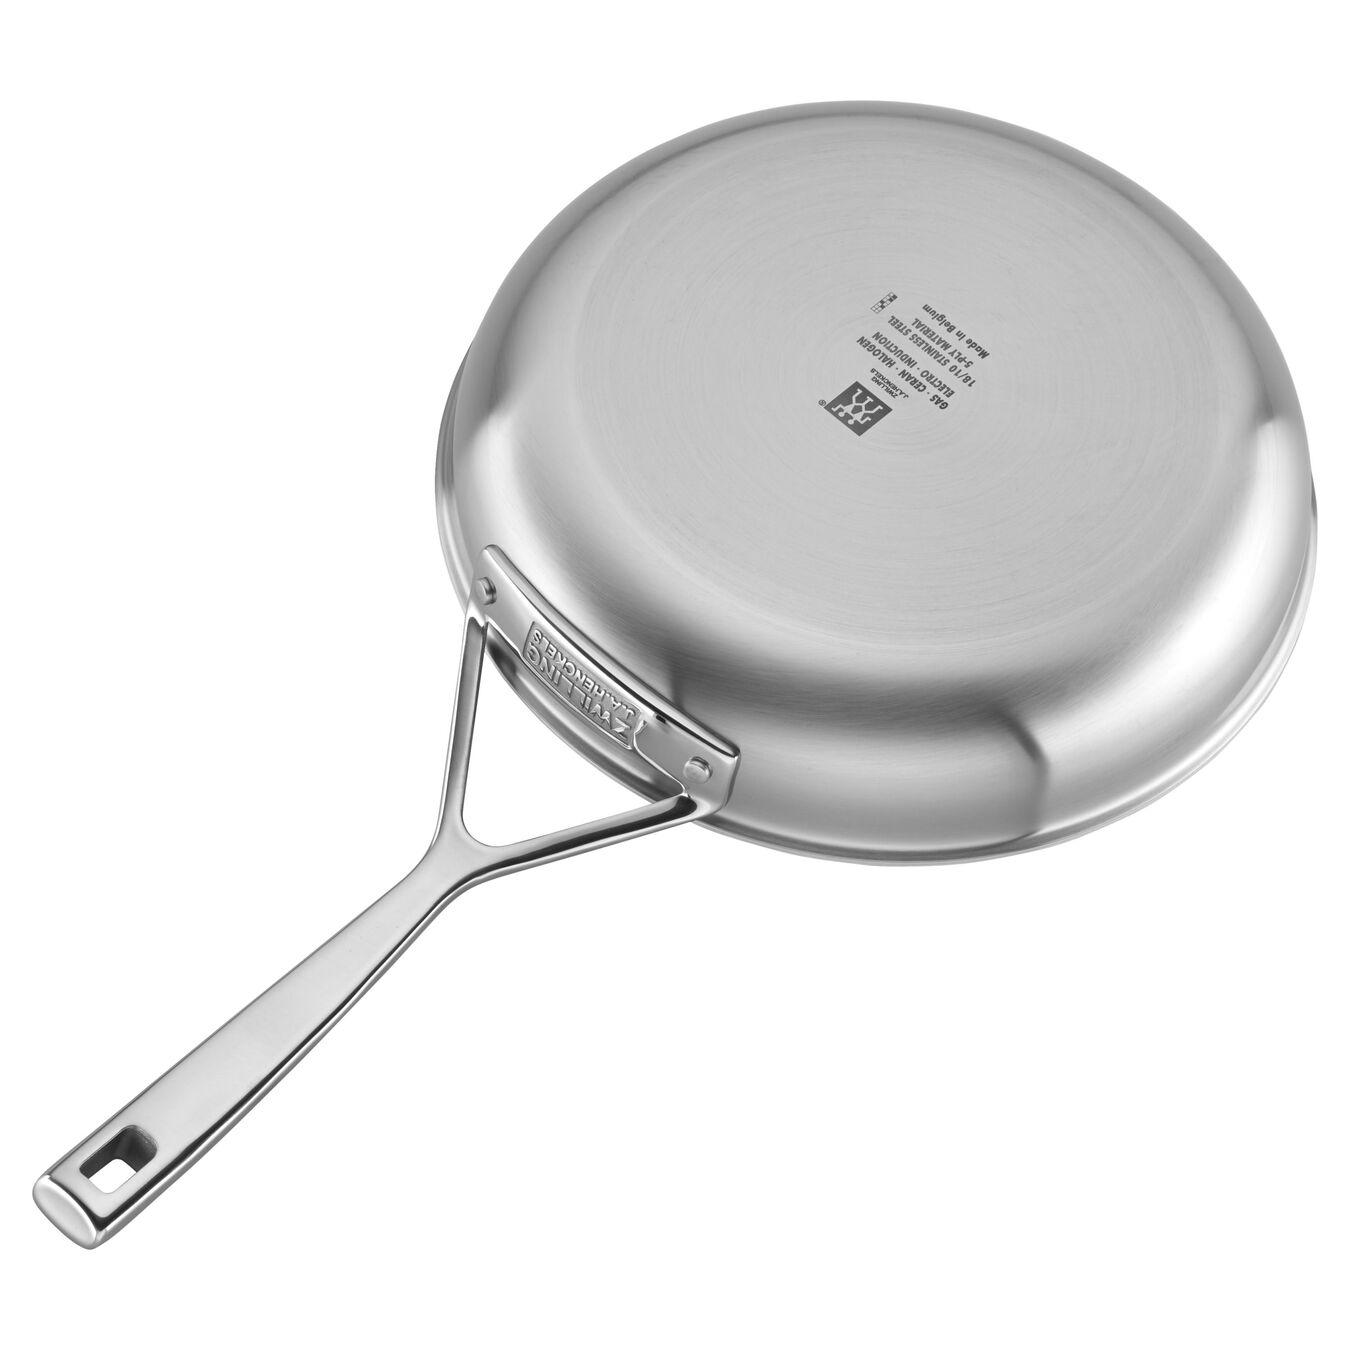 24 cm / 9.5 inch Frying pan,,large 3